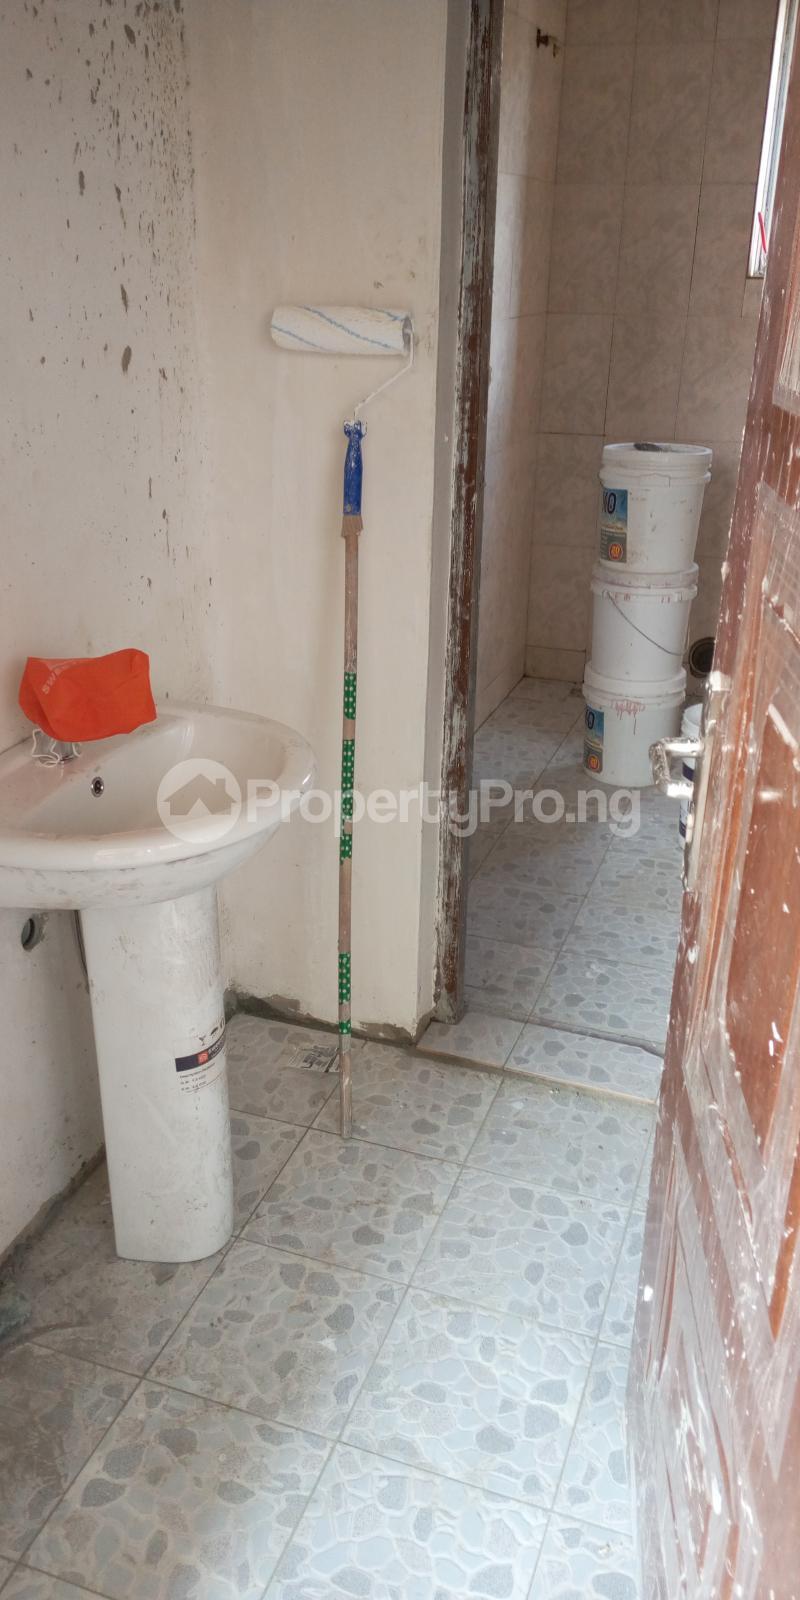 School Commercial Property for sale Eputu Ibeju-Lekki Lagos - 8